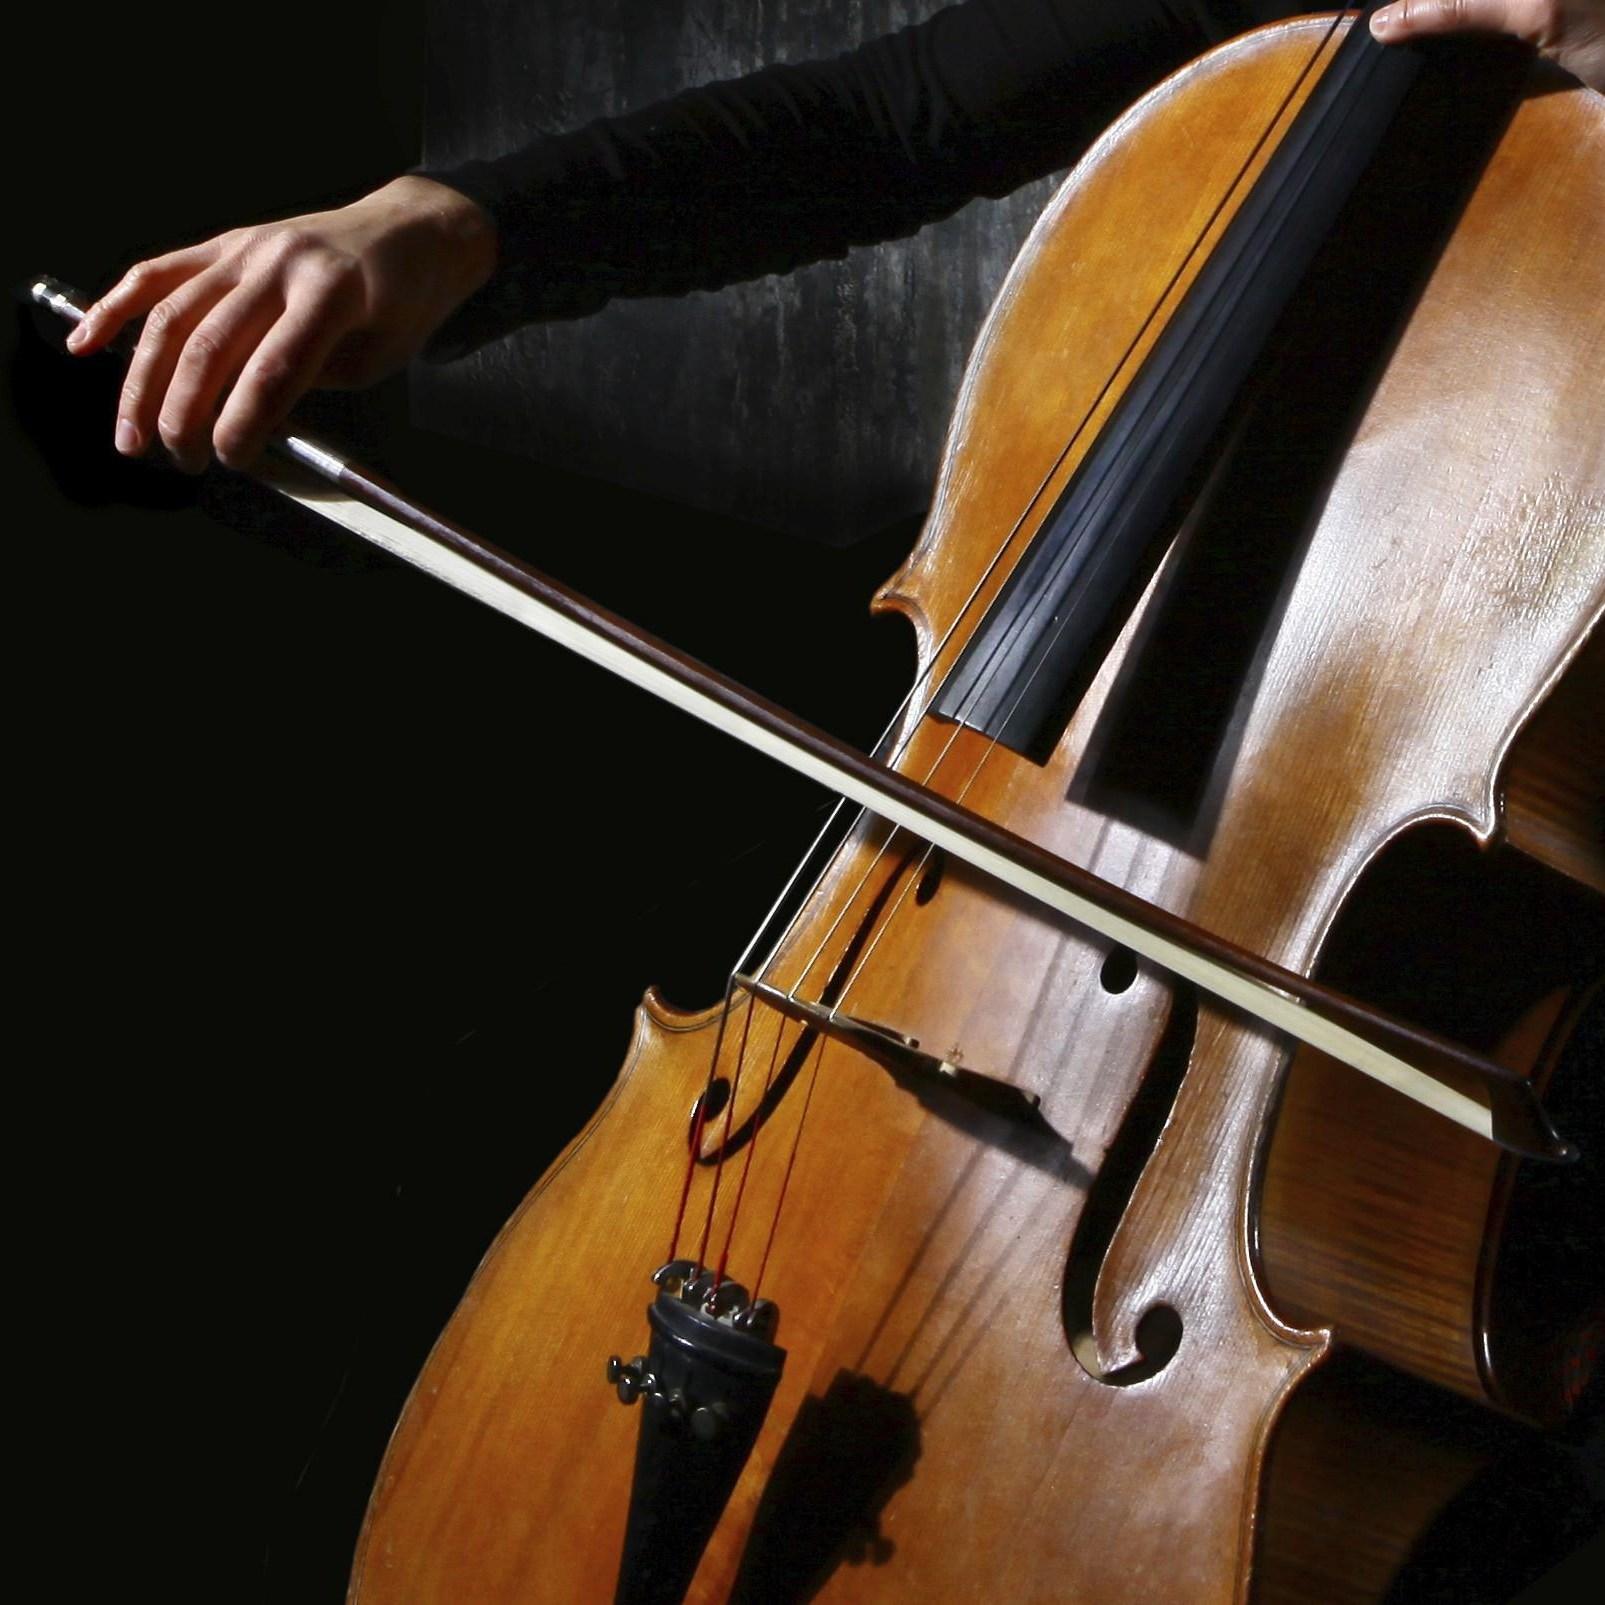 Концерт «Вечер сонат Людвига ван Бетховена» со скидкой 43%